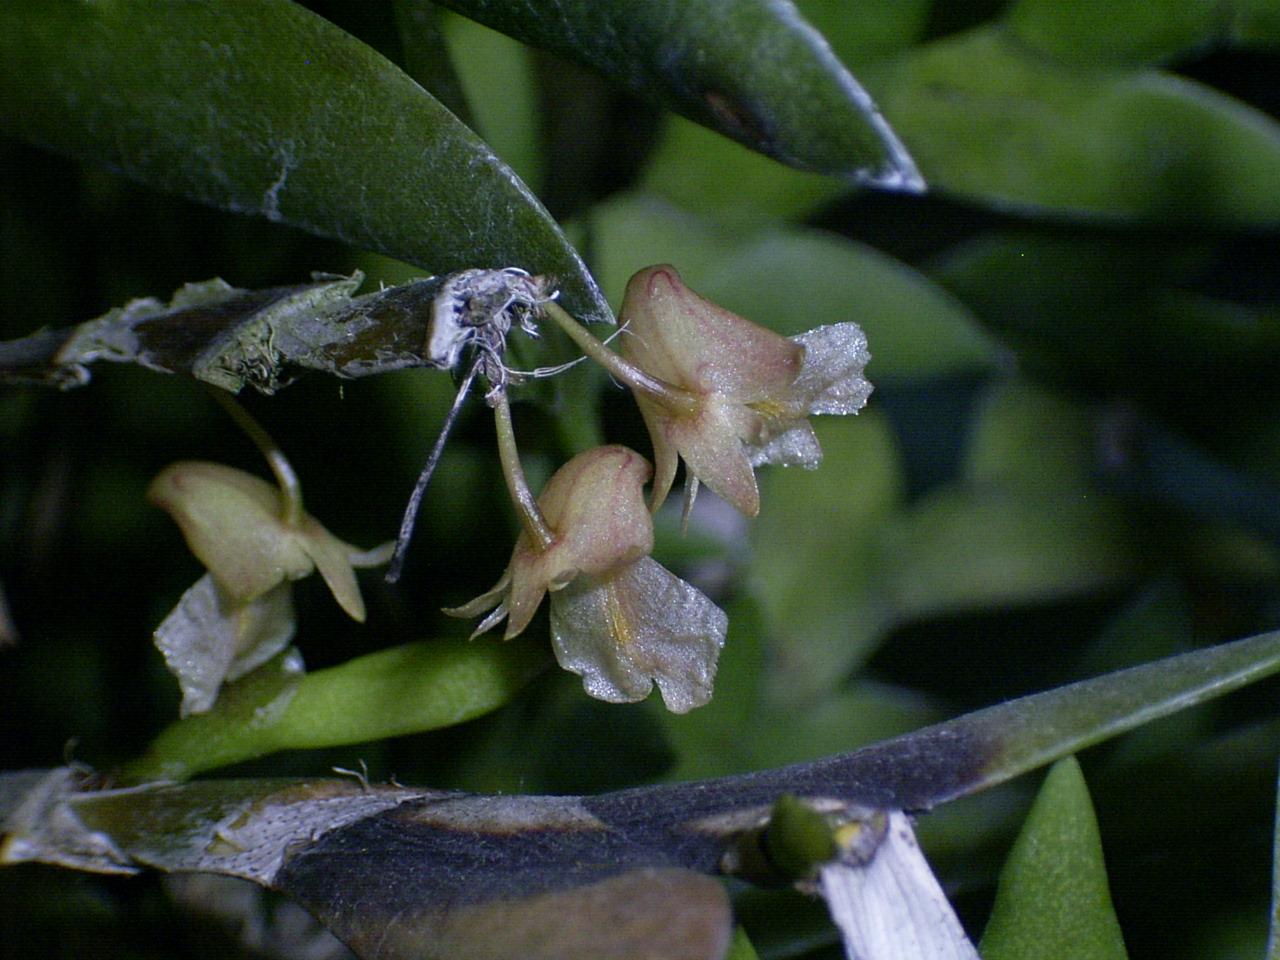 http://orchids.la.coocan.jp/Dendrobium/Dendrobium%20nathanielis/R0050741.JPG